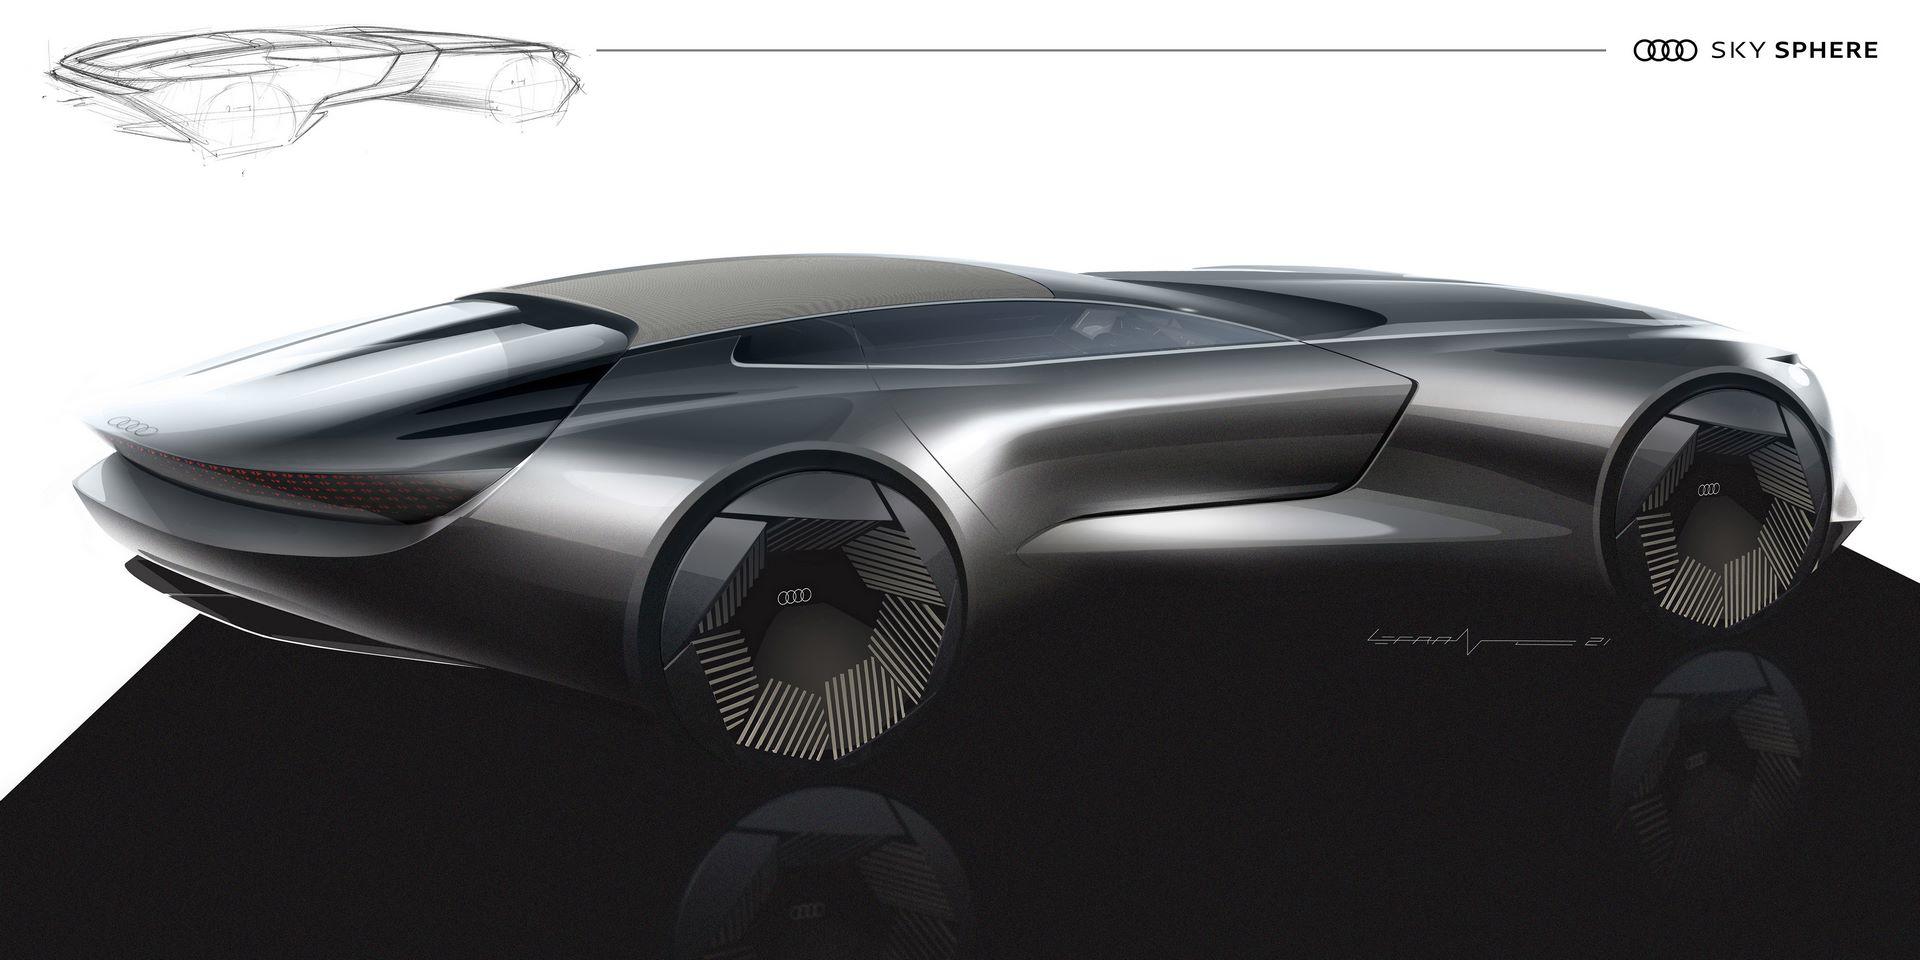 Audi-Skysphere-Concept-39